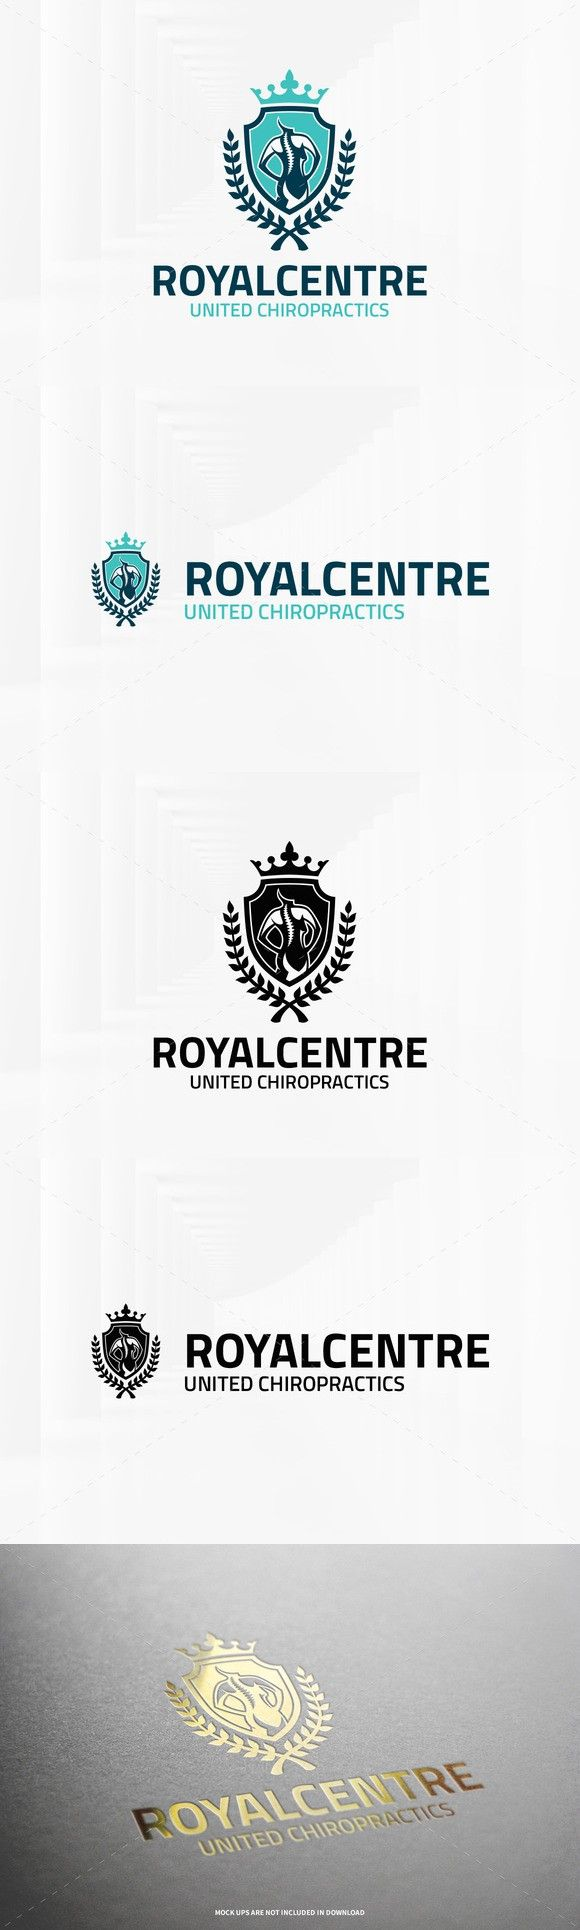 Royal Centre - Chiropractic Logo. Logo Templates. $29.00